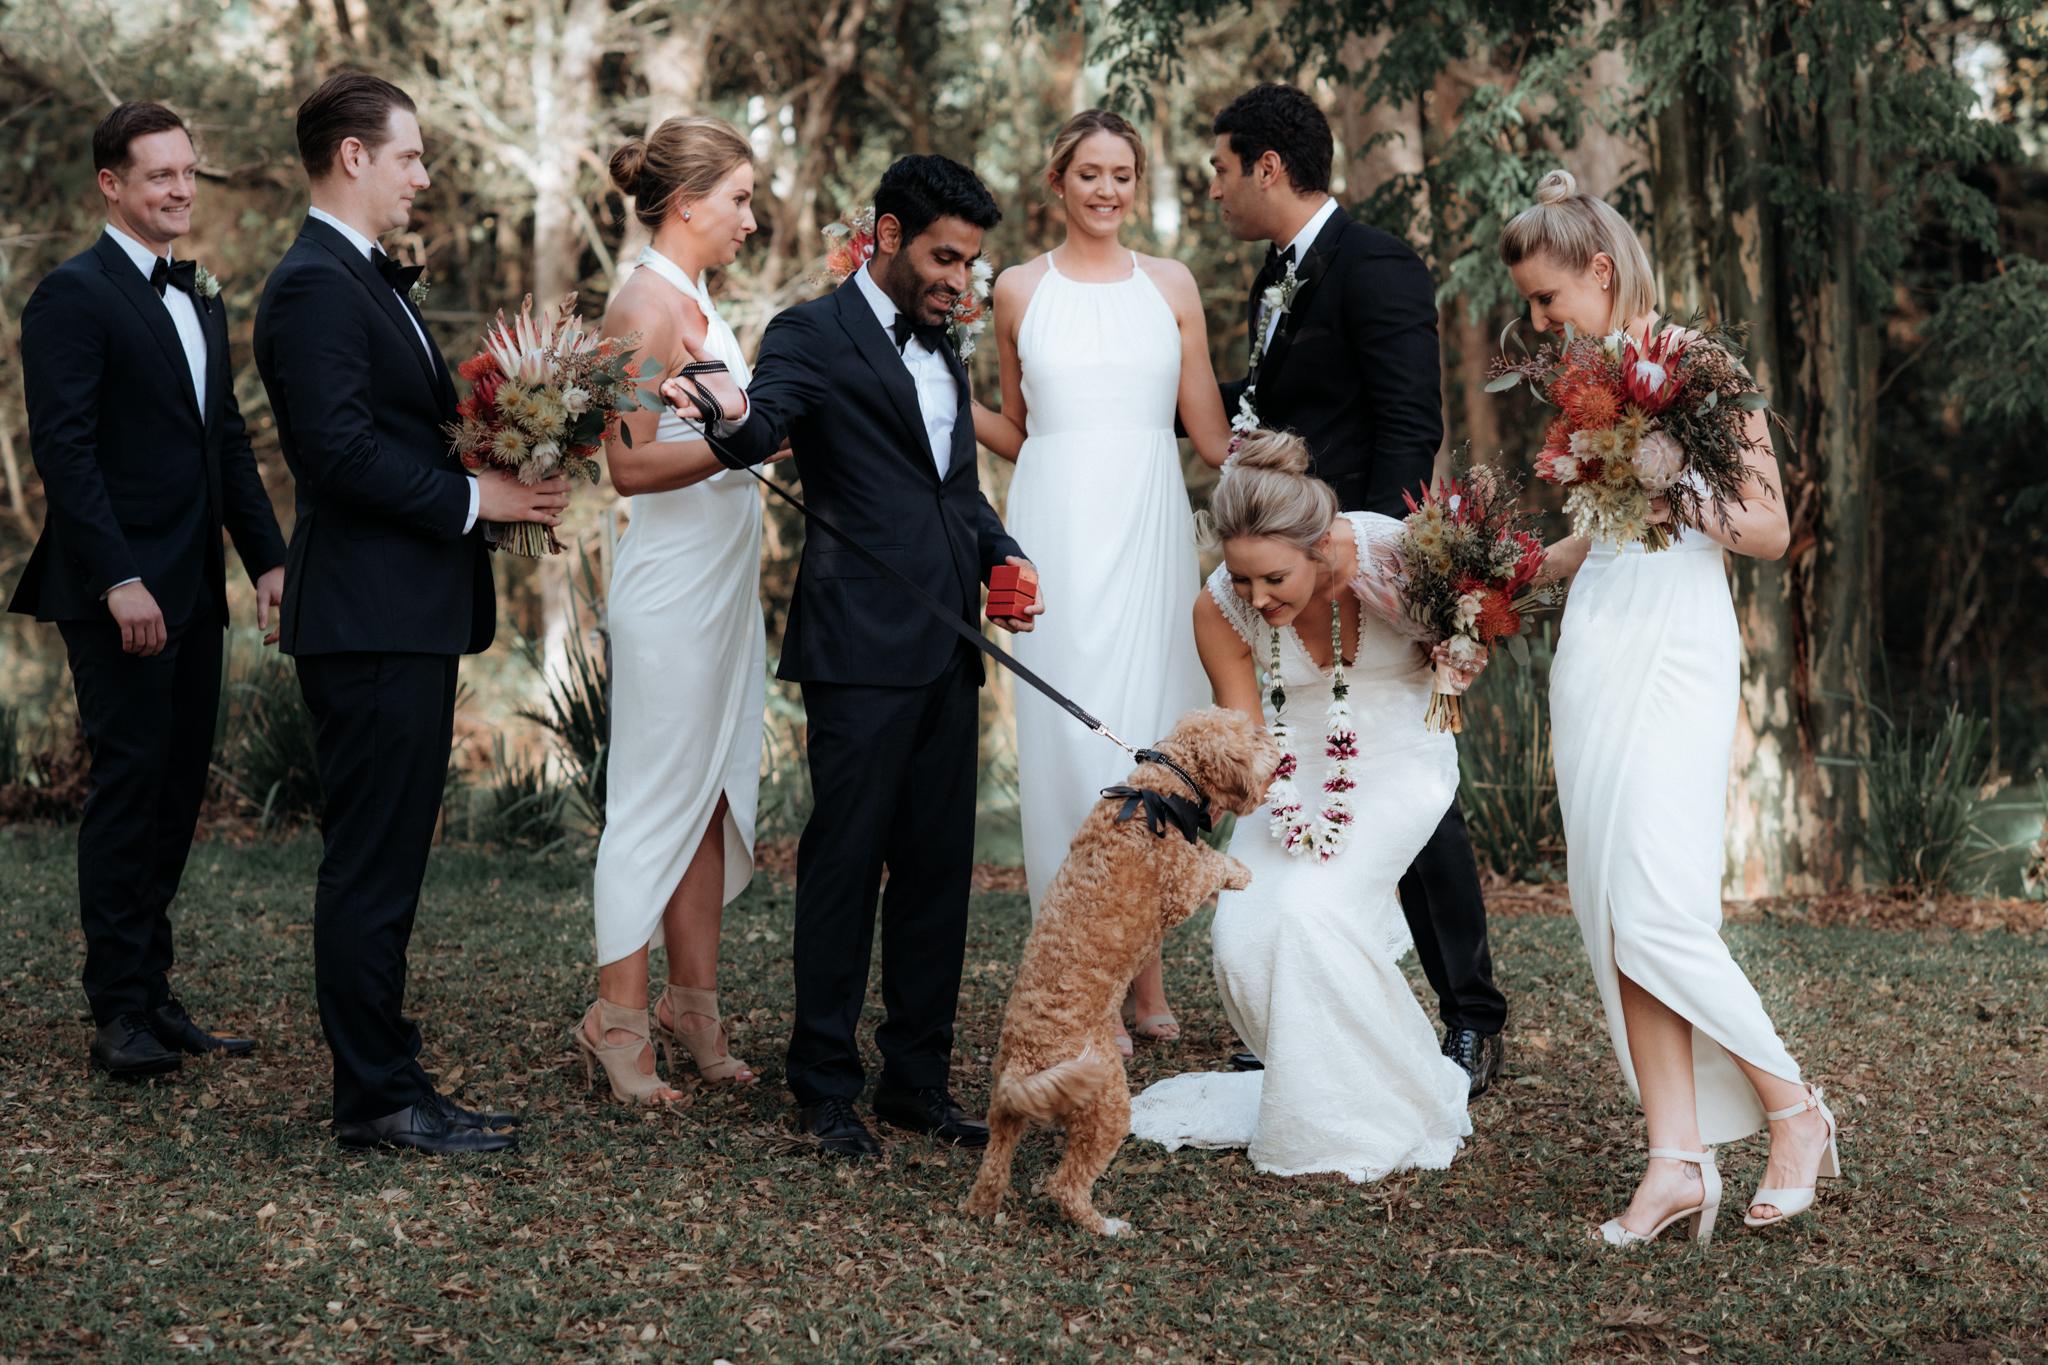 BRISBANE WEDDING PHOTOGRAPHER • BUNDALEER RAINFOREST GARDENS WEDDING • ONE DAY BRIDAL WEDDING GOWN • ROXY HOTTEN CELEBRANT • LOVELENSCAPES PHOTOGRAPHY • 107.jpg